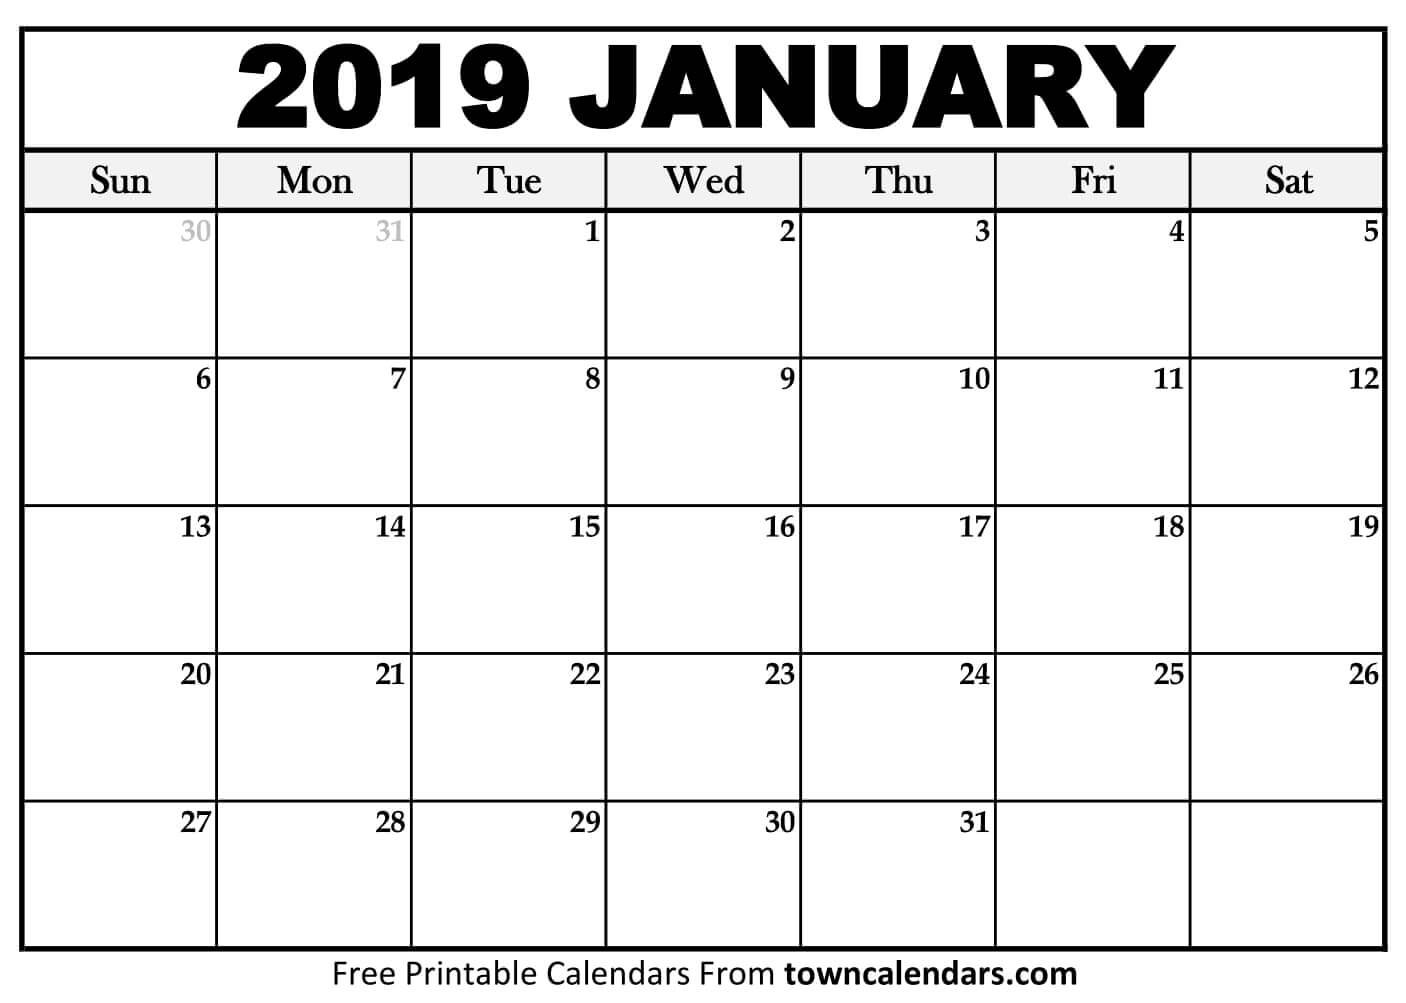 Printable January 2019 Calendar – Towncalendars Calendar 2019 Jan